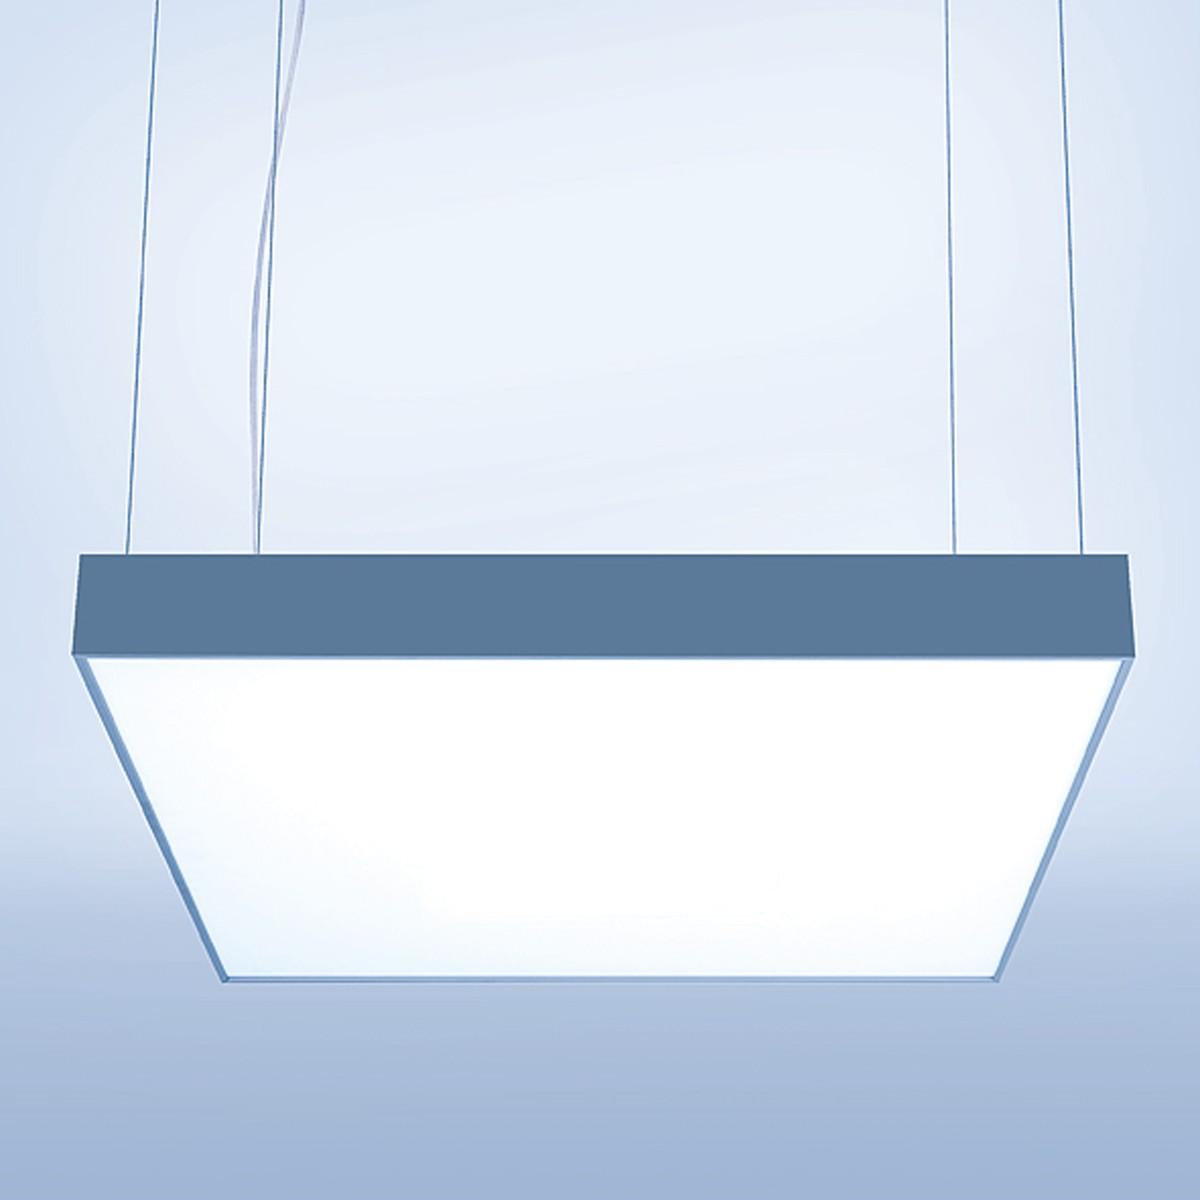 Lightnet Cubic-P2 Pendelleuchte, 53 x 53 cm, Aluminium natureloxiert